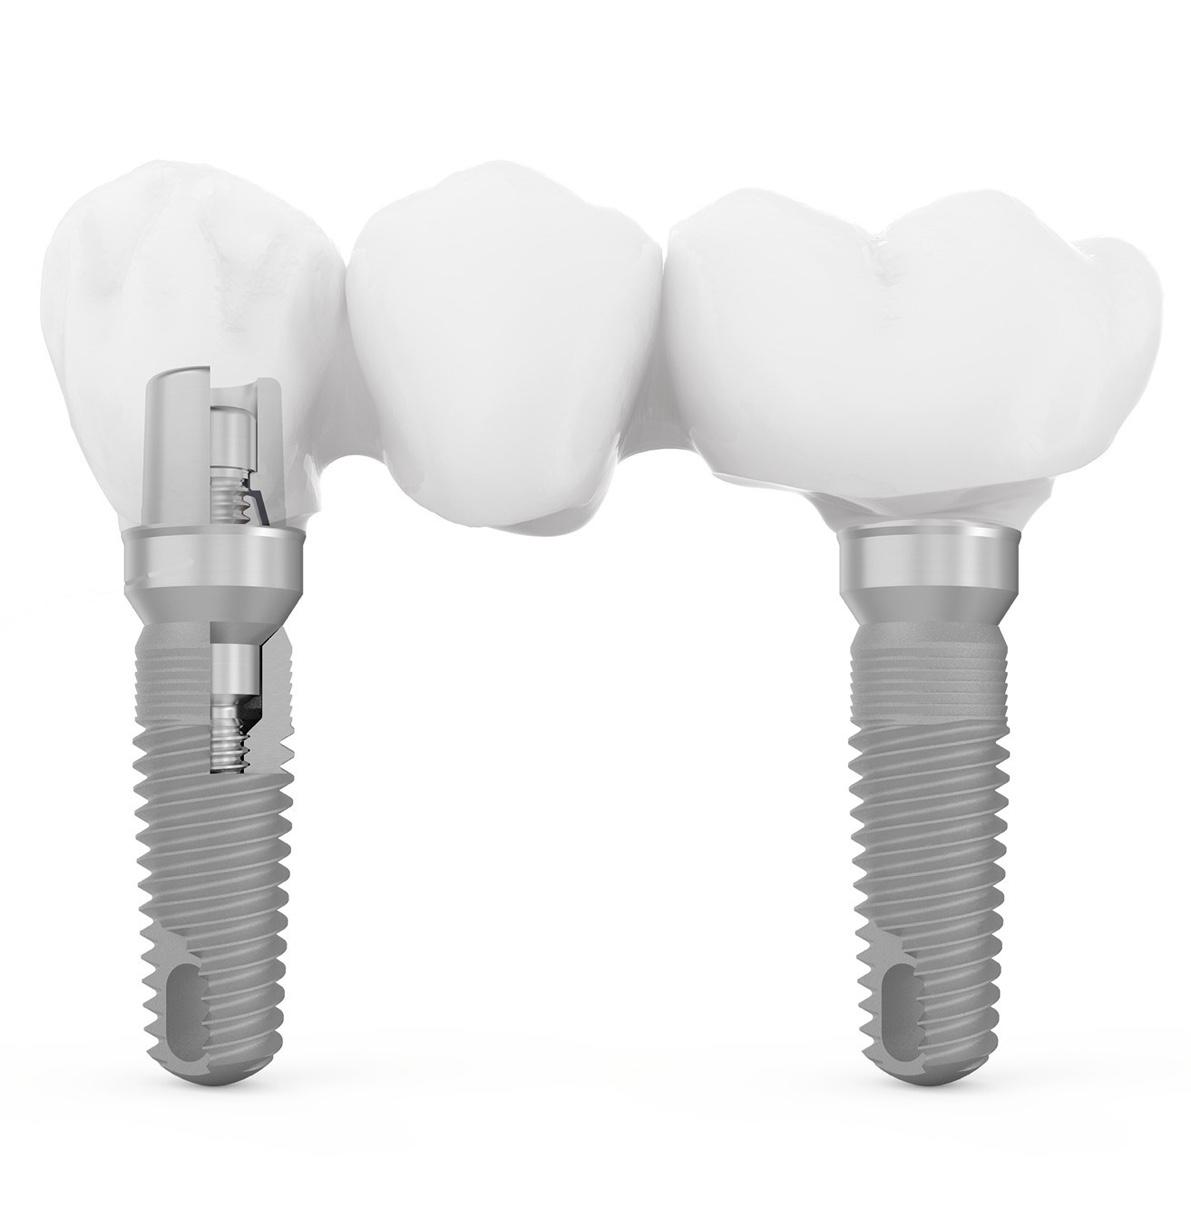 Implantologia   Dott.ssa Rinaldi   Impianto dentale